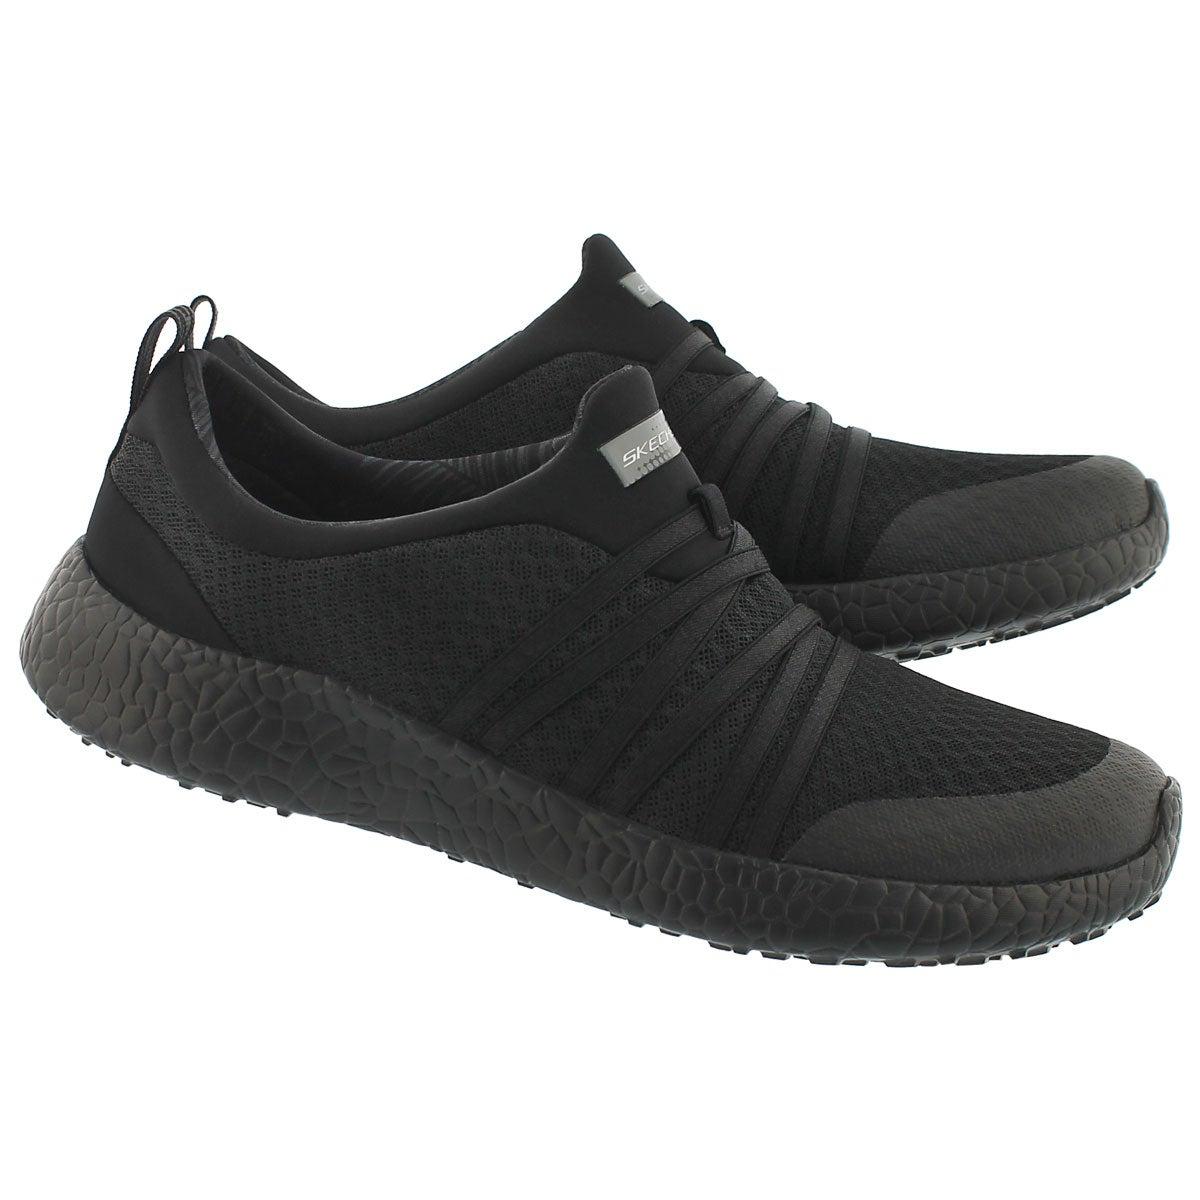 Lds Very Daring blk slip on sneaker